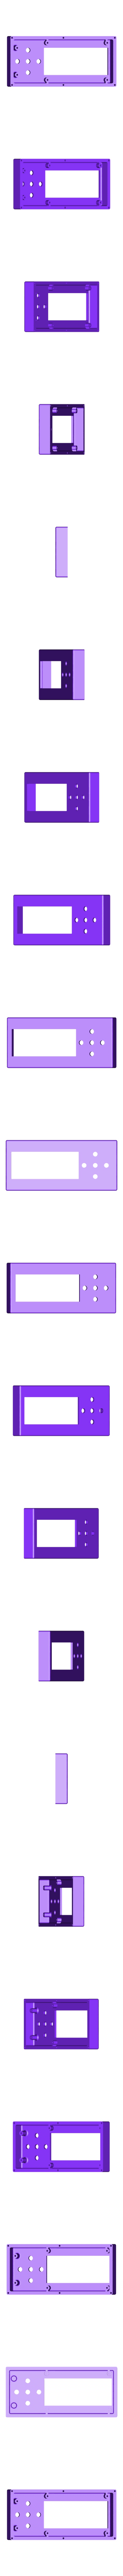 boitier afficheur face avant.stl Download free STL file Display case Prusa I3 • 3D printer model, Alienmaker